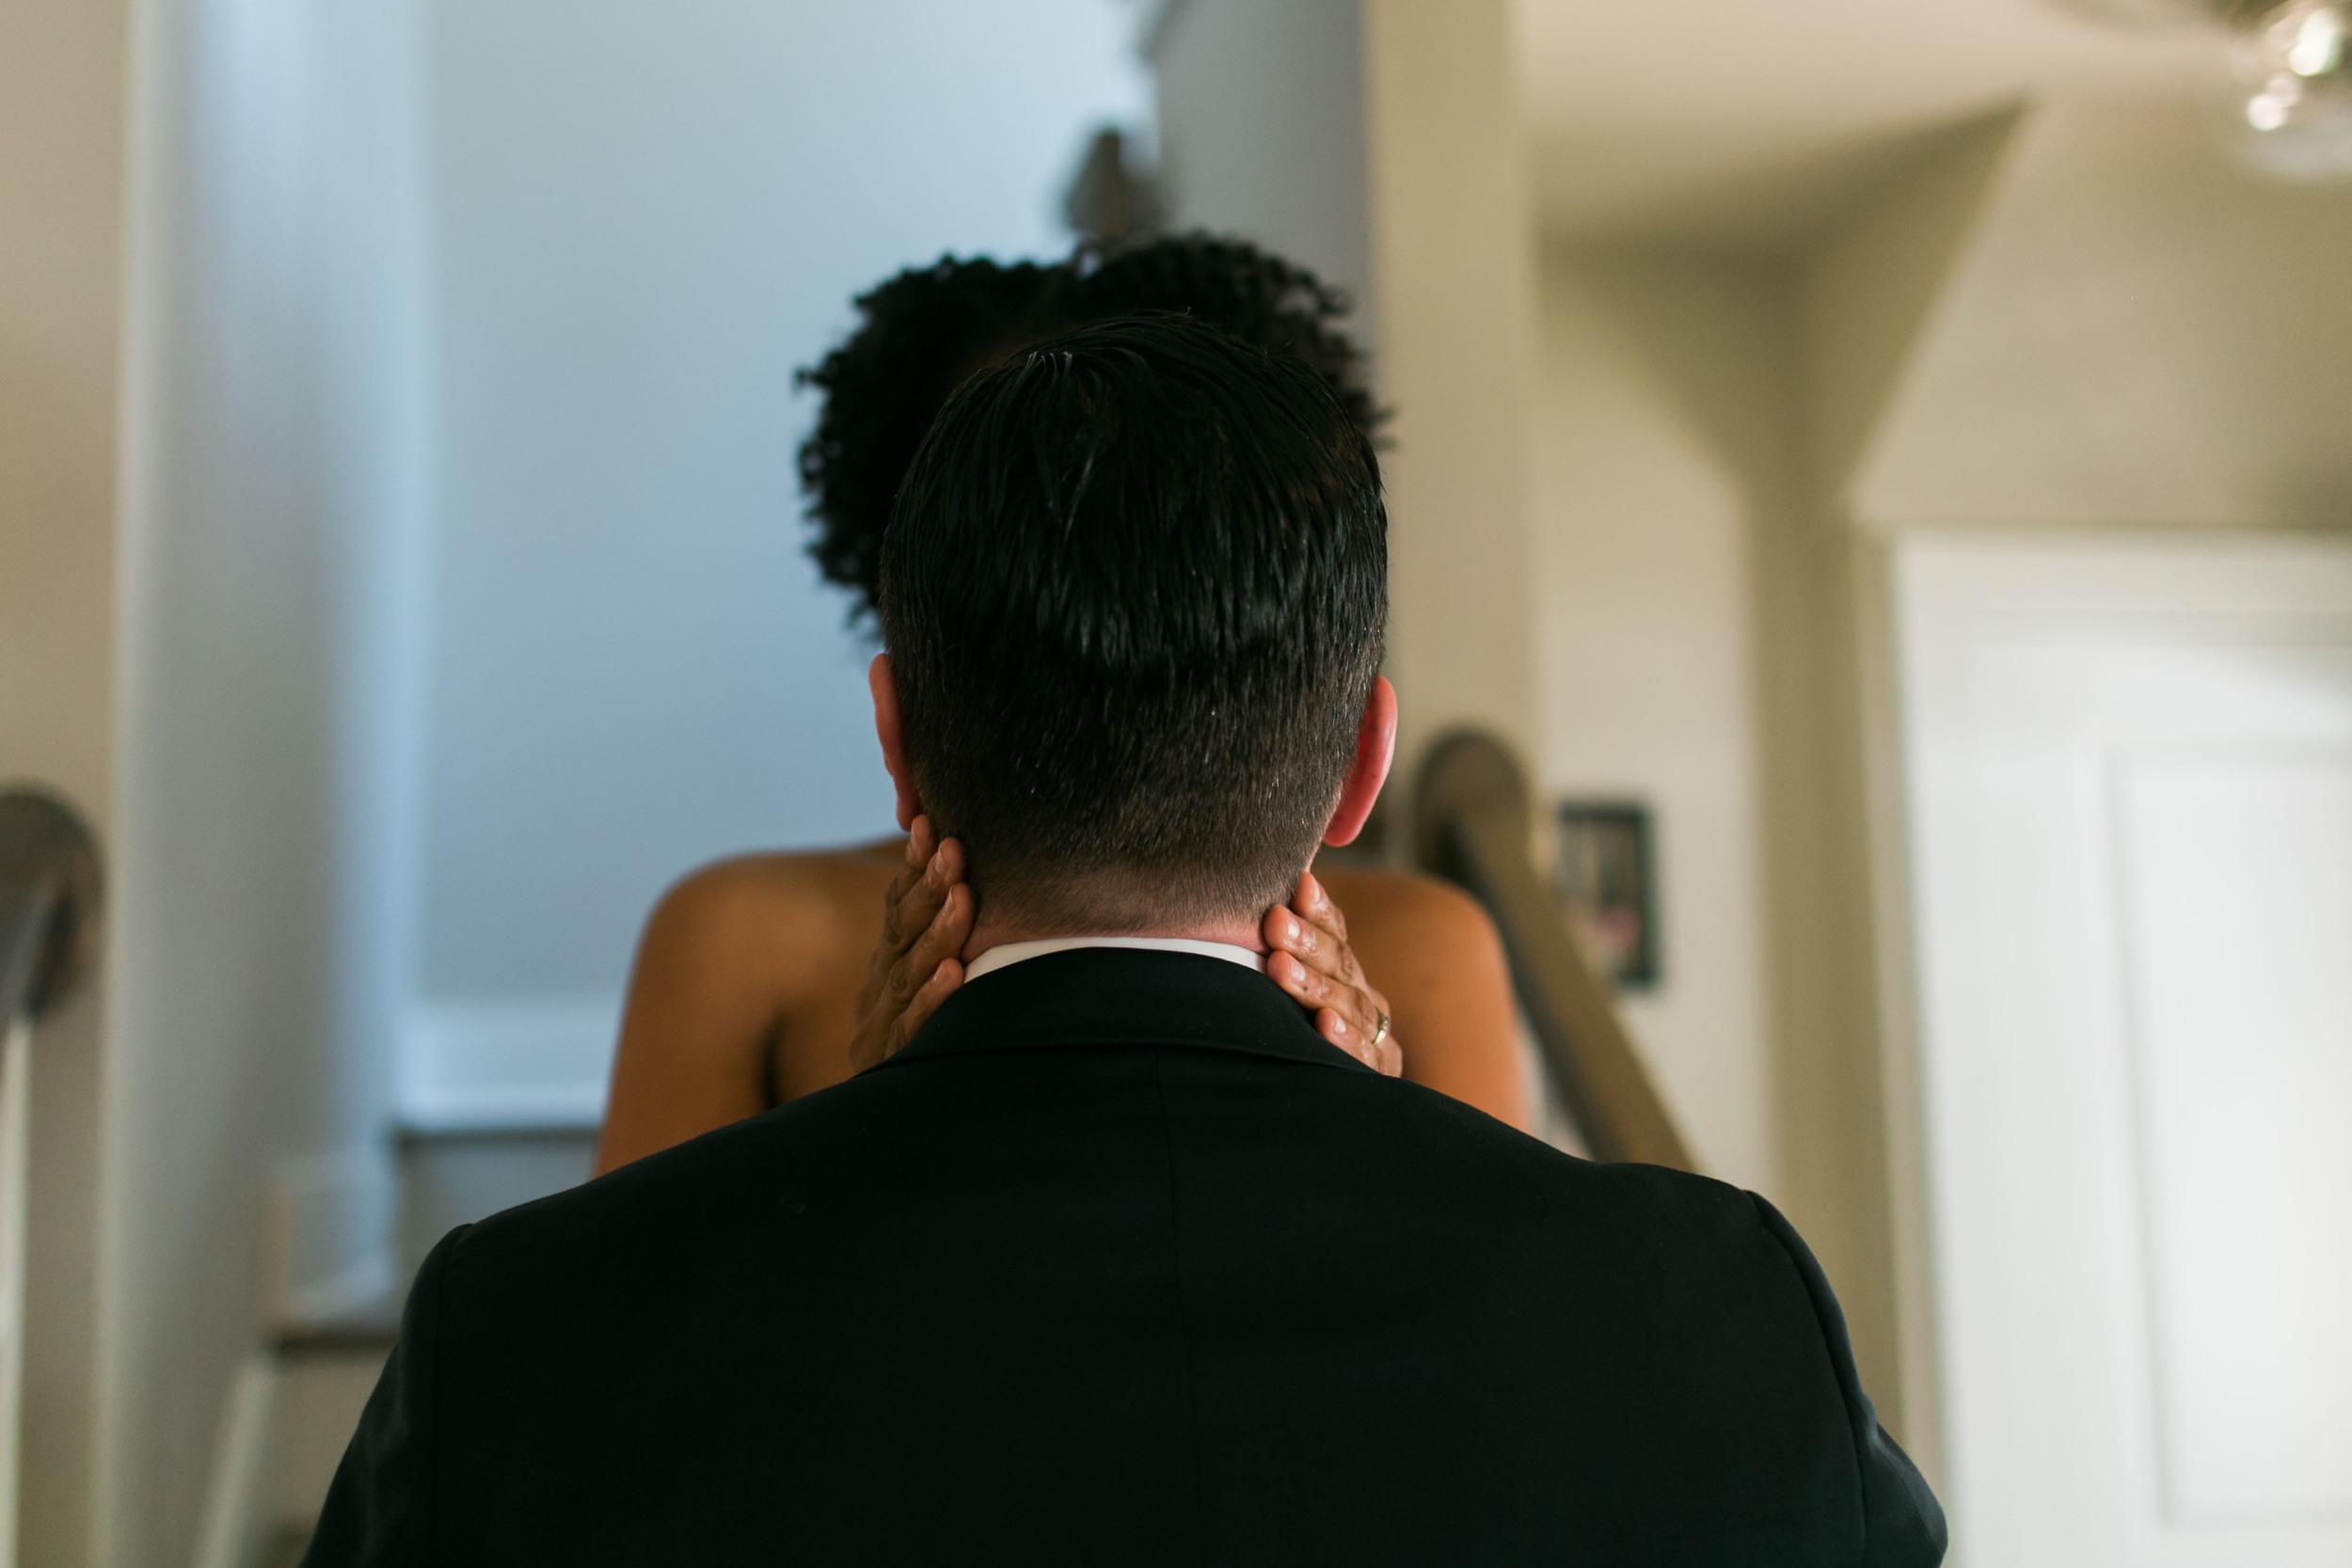 Dekalb-County-Courthouse-Wedding-Photos-Kiyah-C-Photography-22.jpg